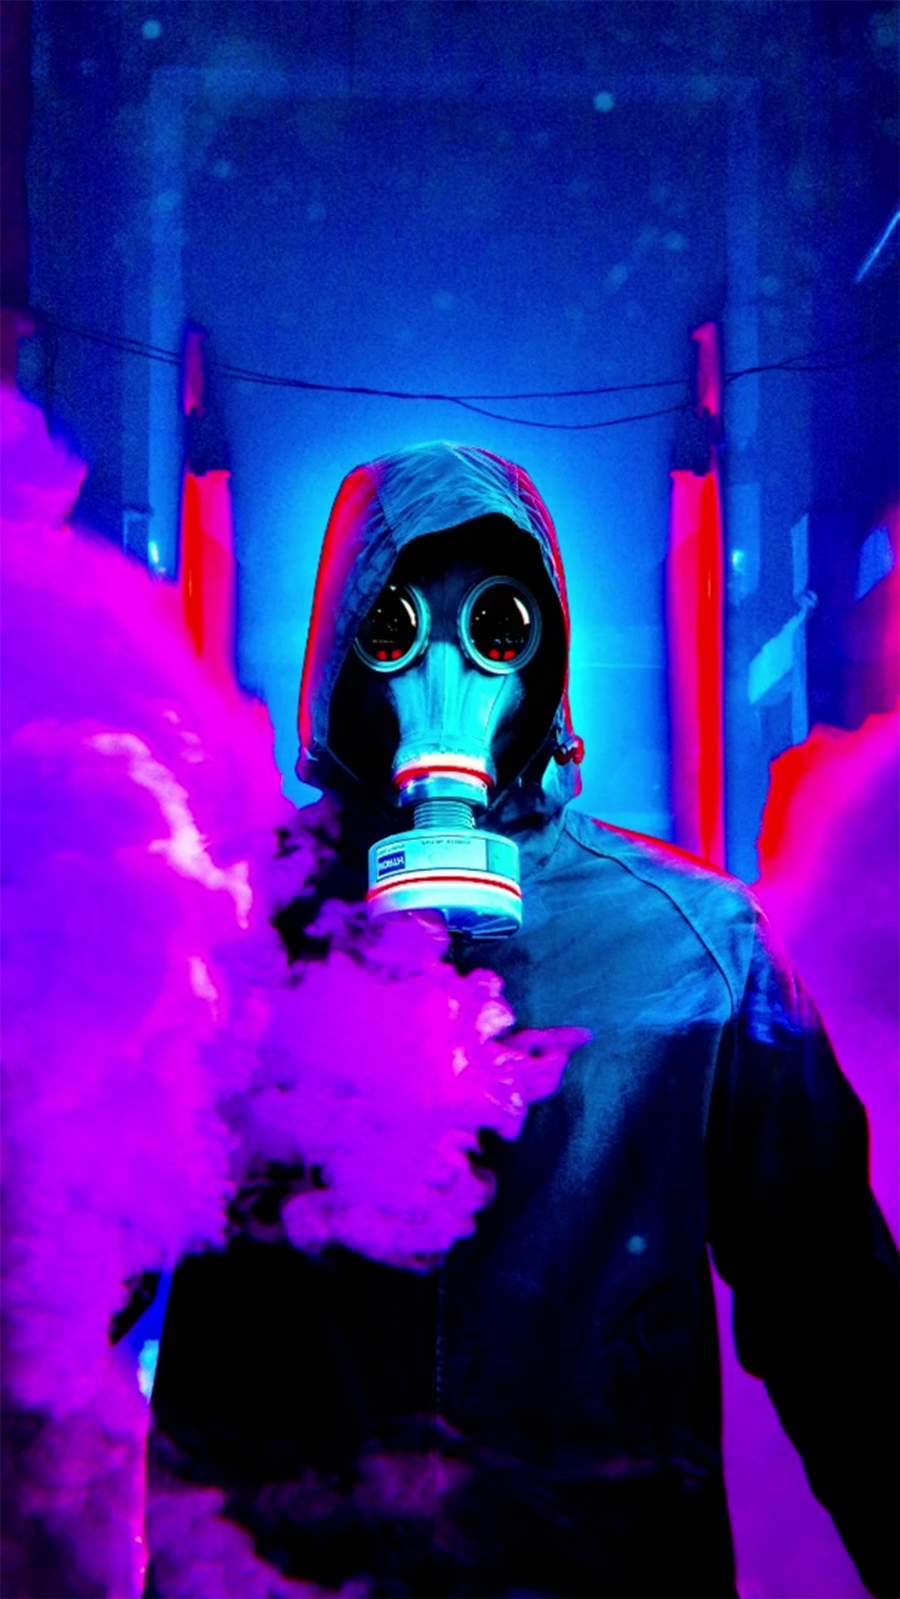 Smoke Neon Mask iPhone Wallpaper